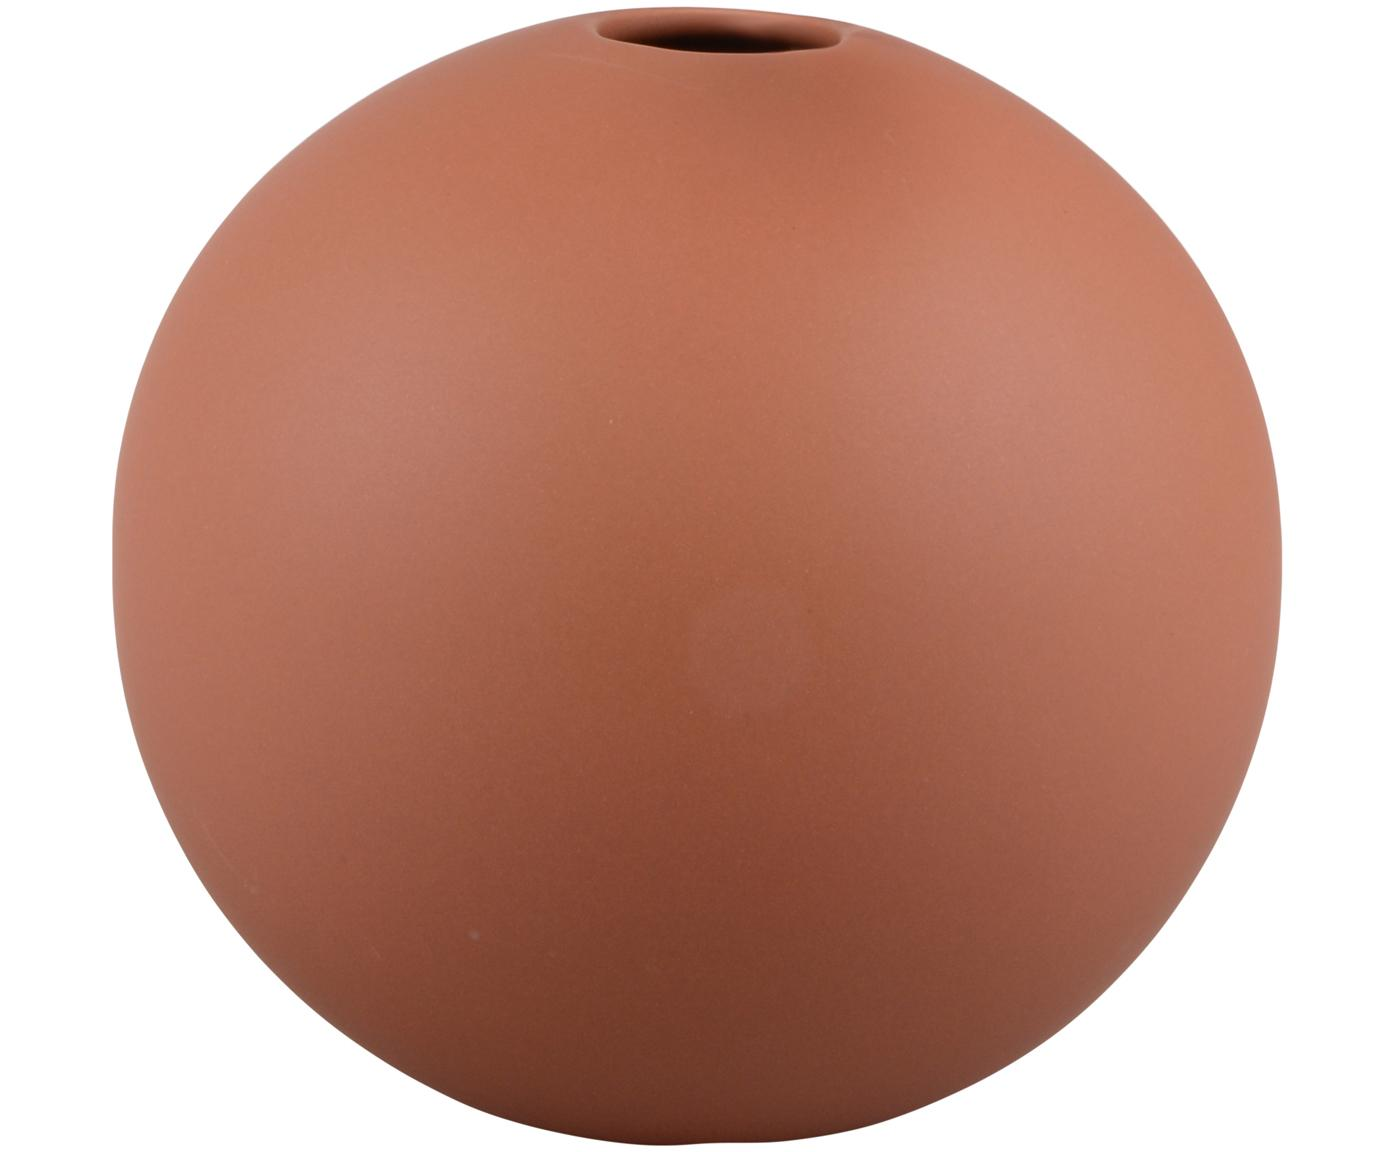 Vaso a sfera in ceramica Rita, Ceramica, Rosso, Ø 12 x Alt. 12 cm